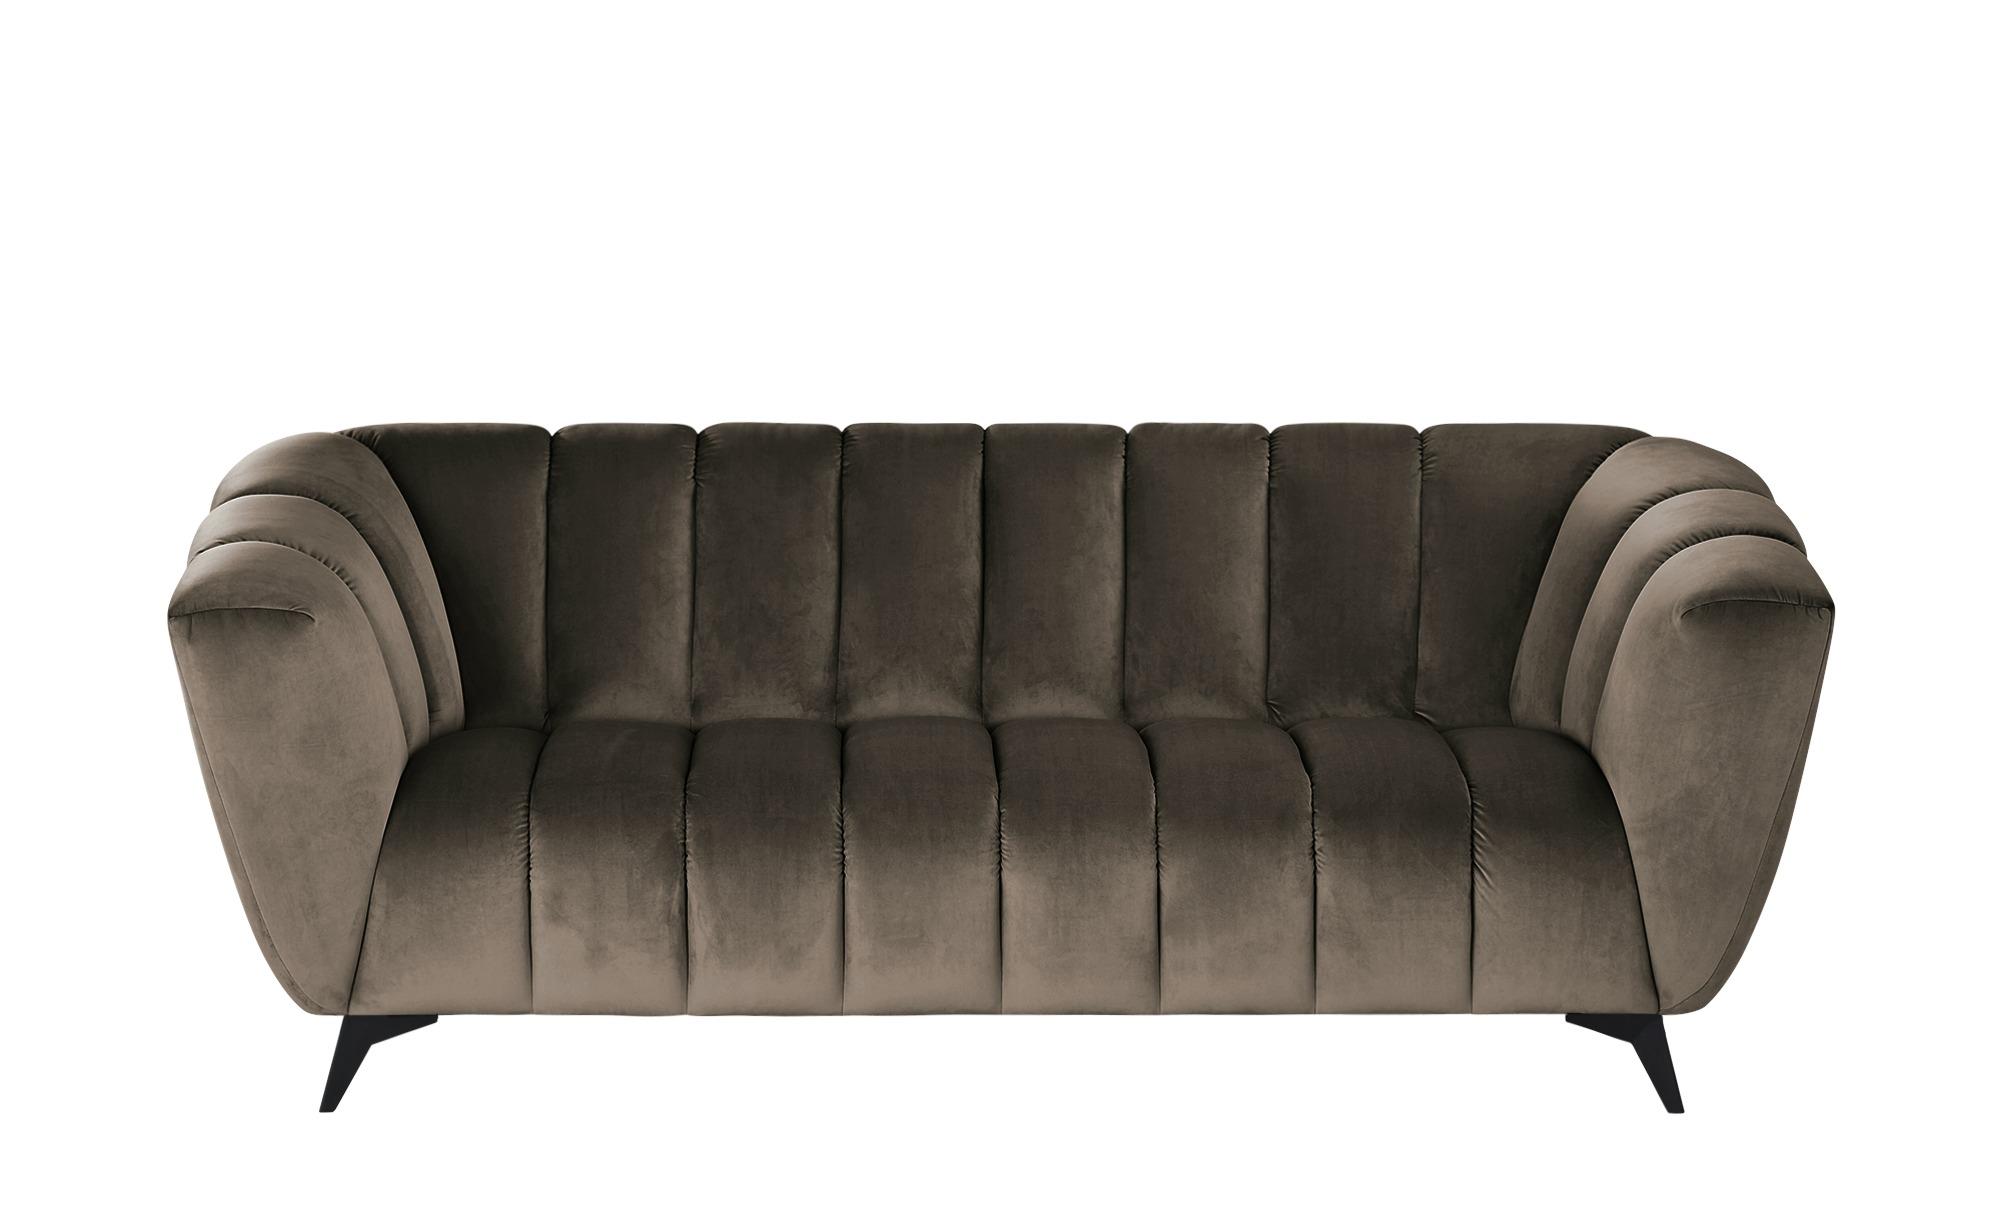 Sofa  Samantha ¦ braun ¦ Maße (cm): B: 220 H: 86 T: 100 Polstermöbel > Sofas > 3-Sitzer - Höffner